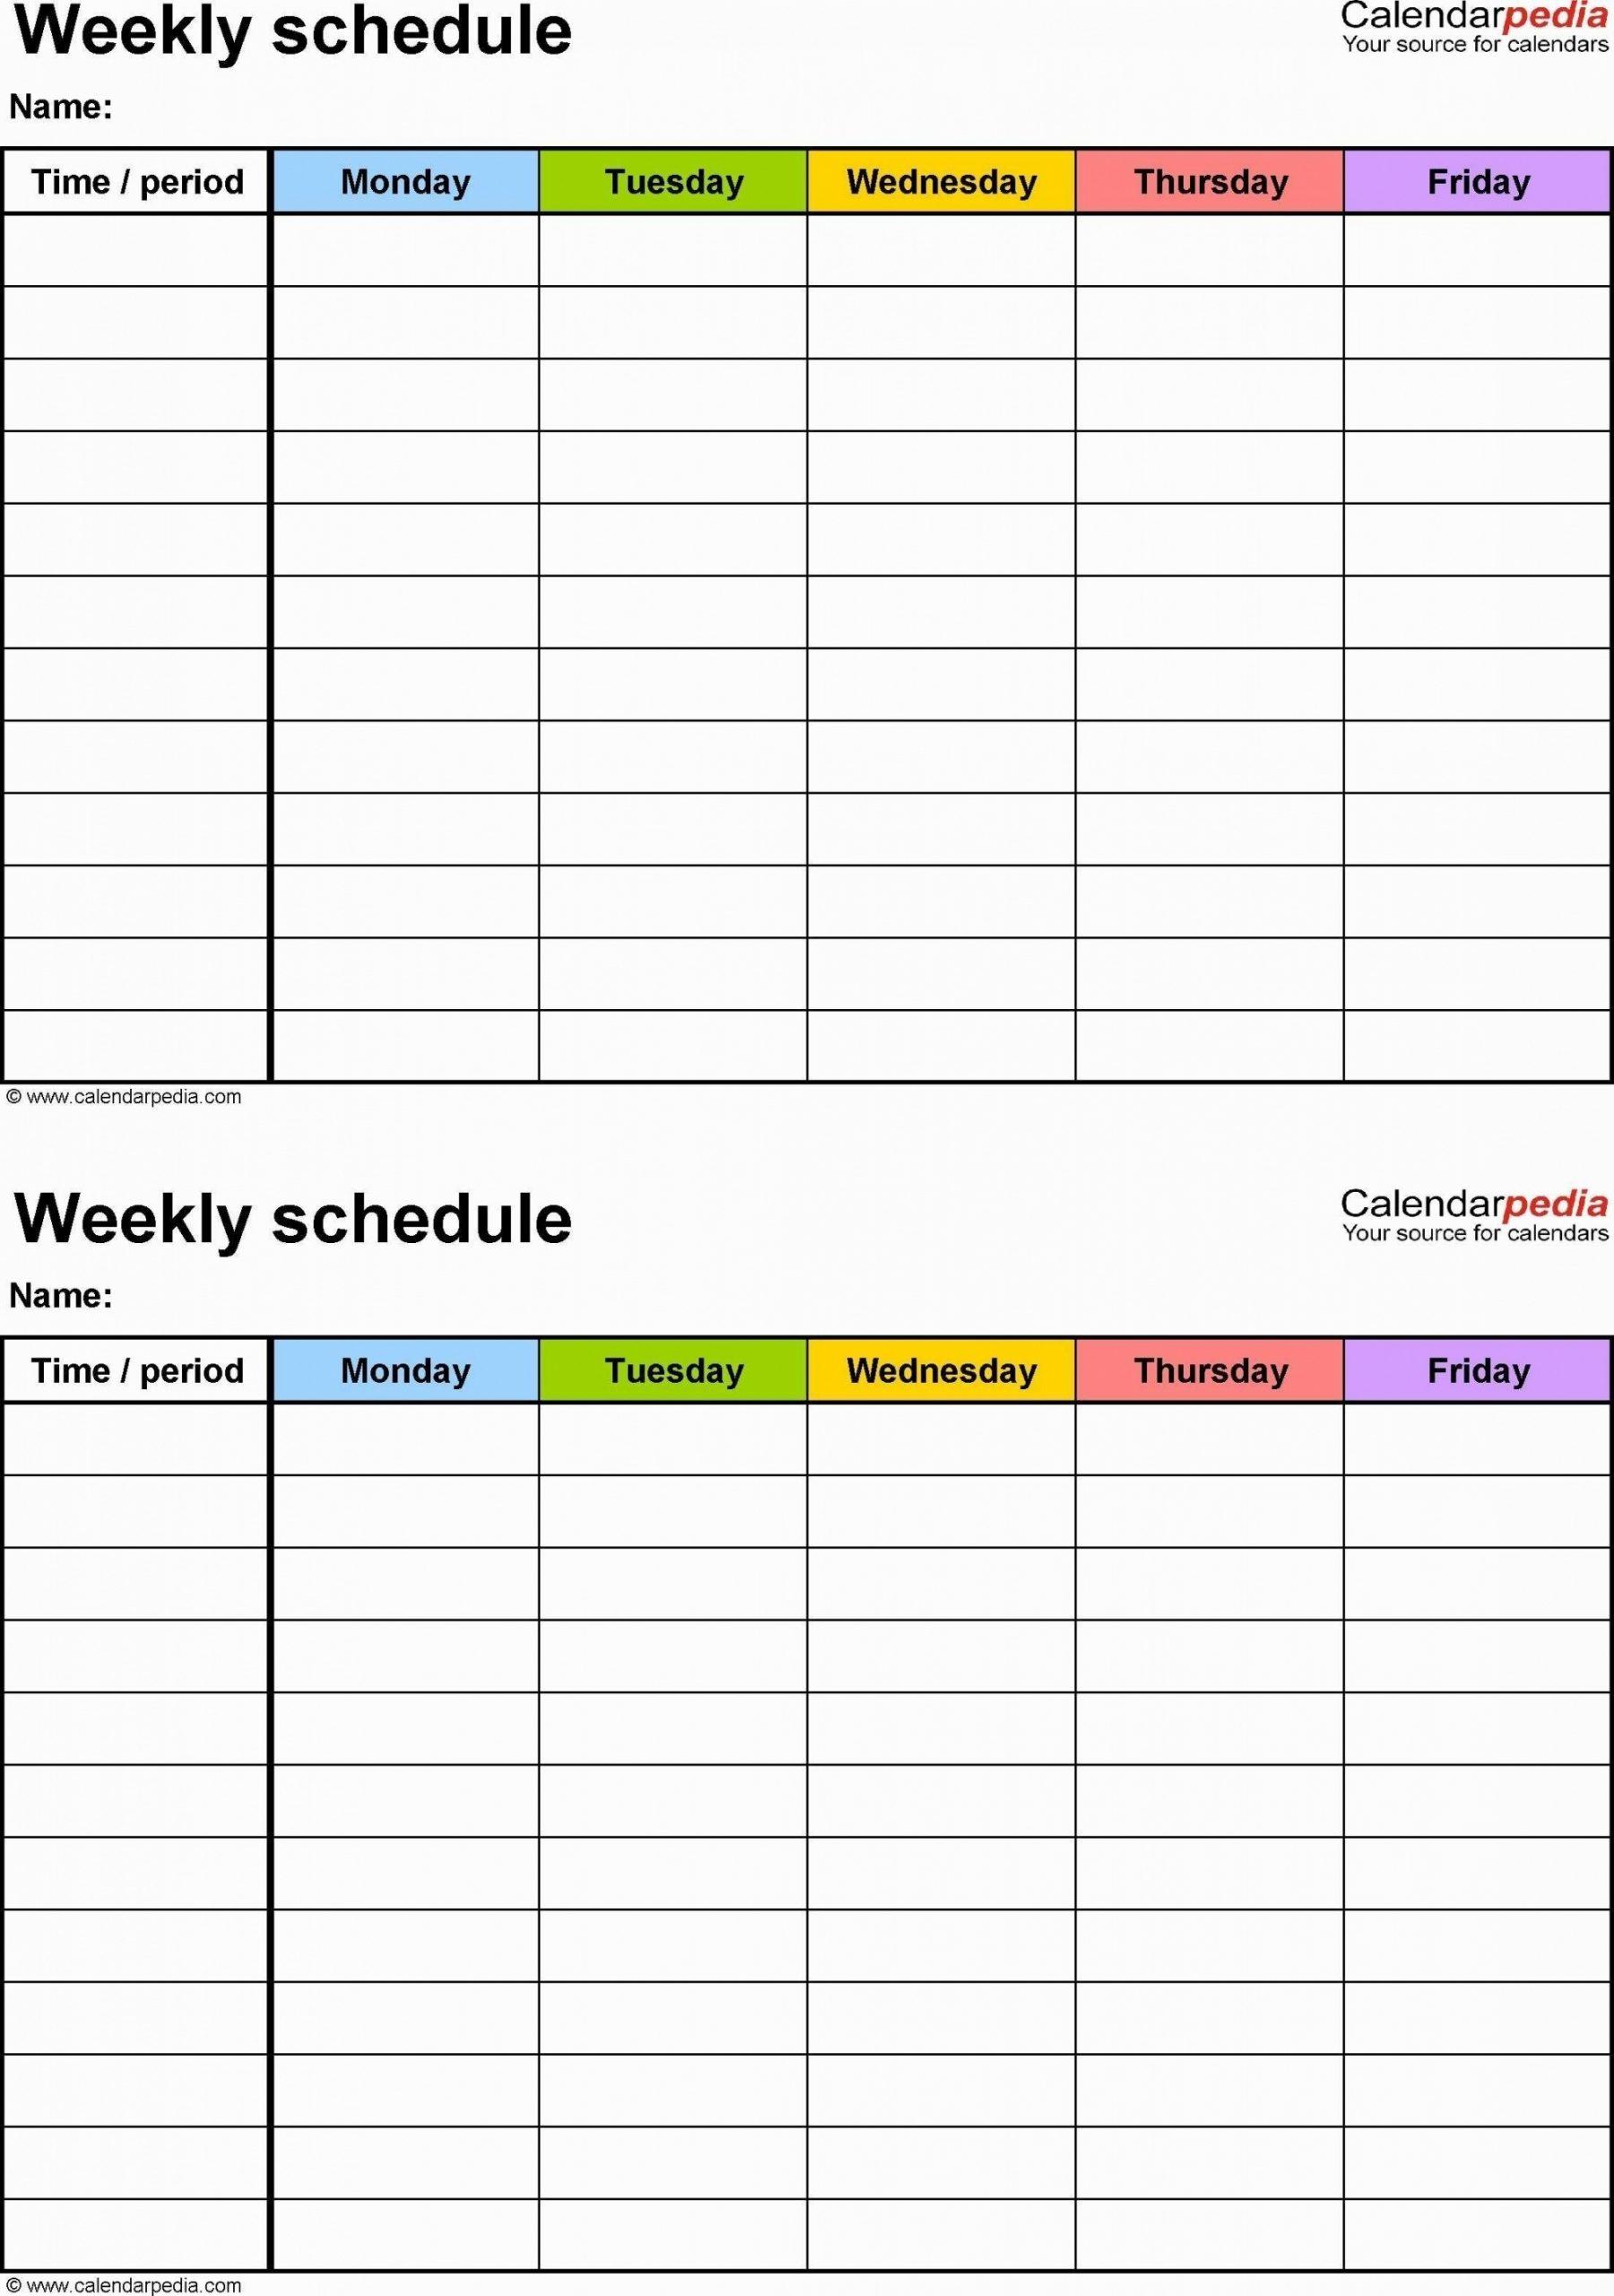 12 Hour Shift Schedule Template - Calendar Inspiration Design pertaining to 12 Hour Shift Schedule Calendar